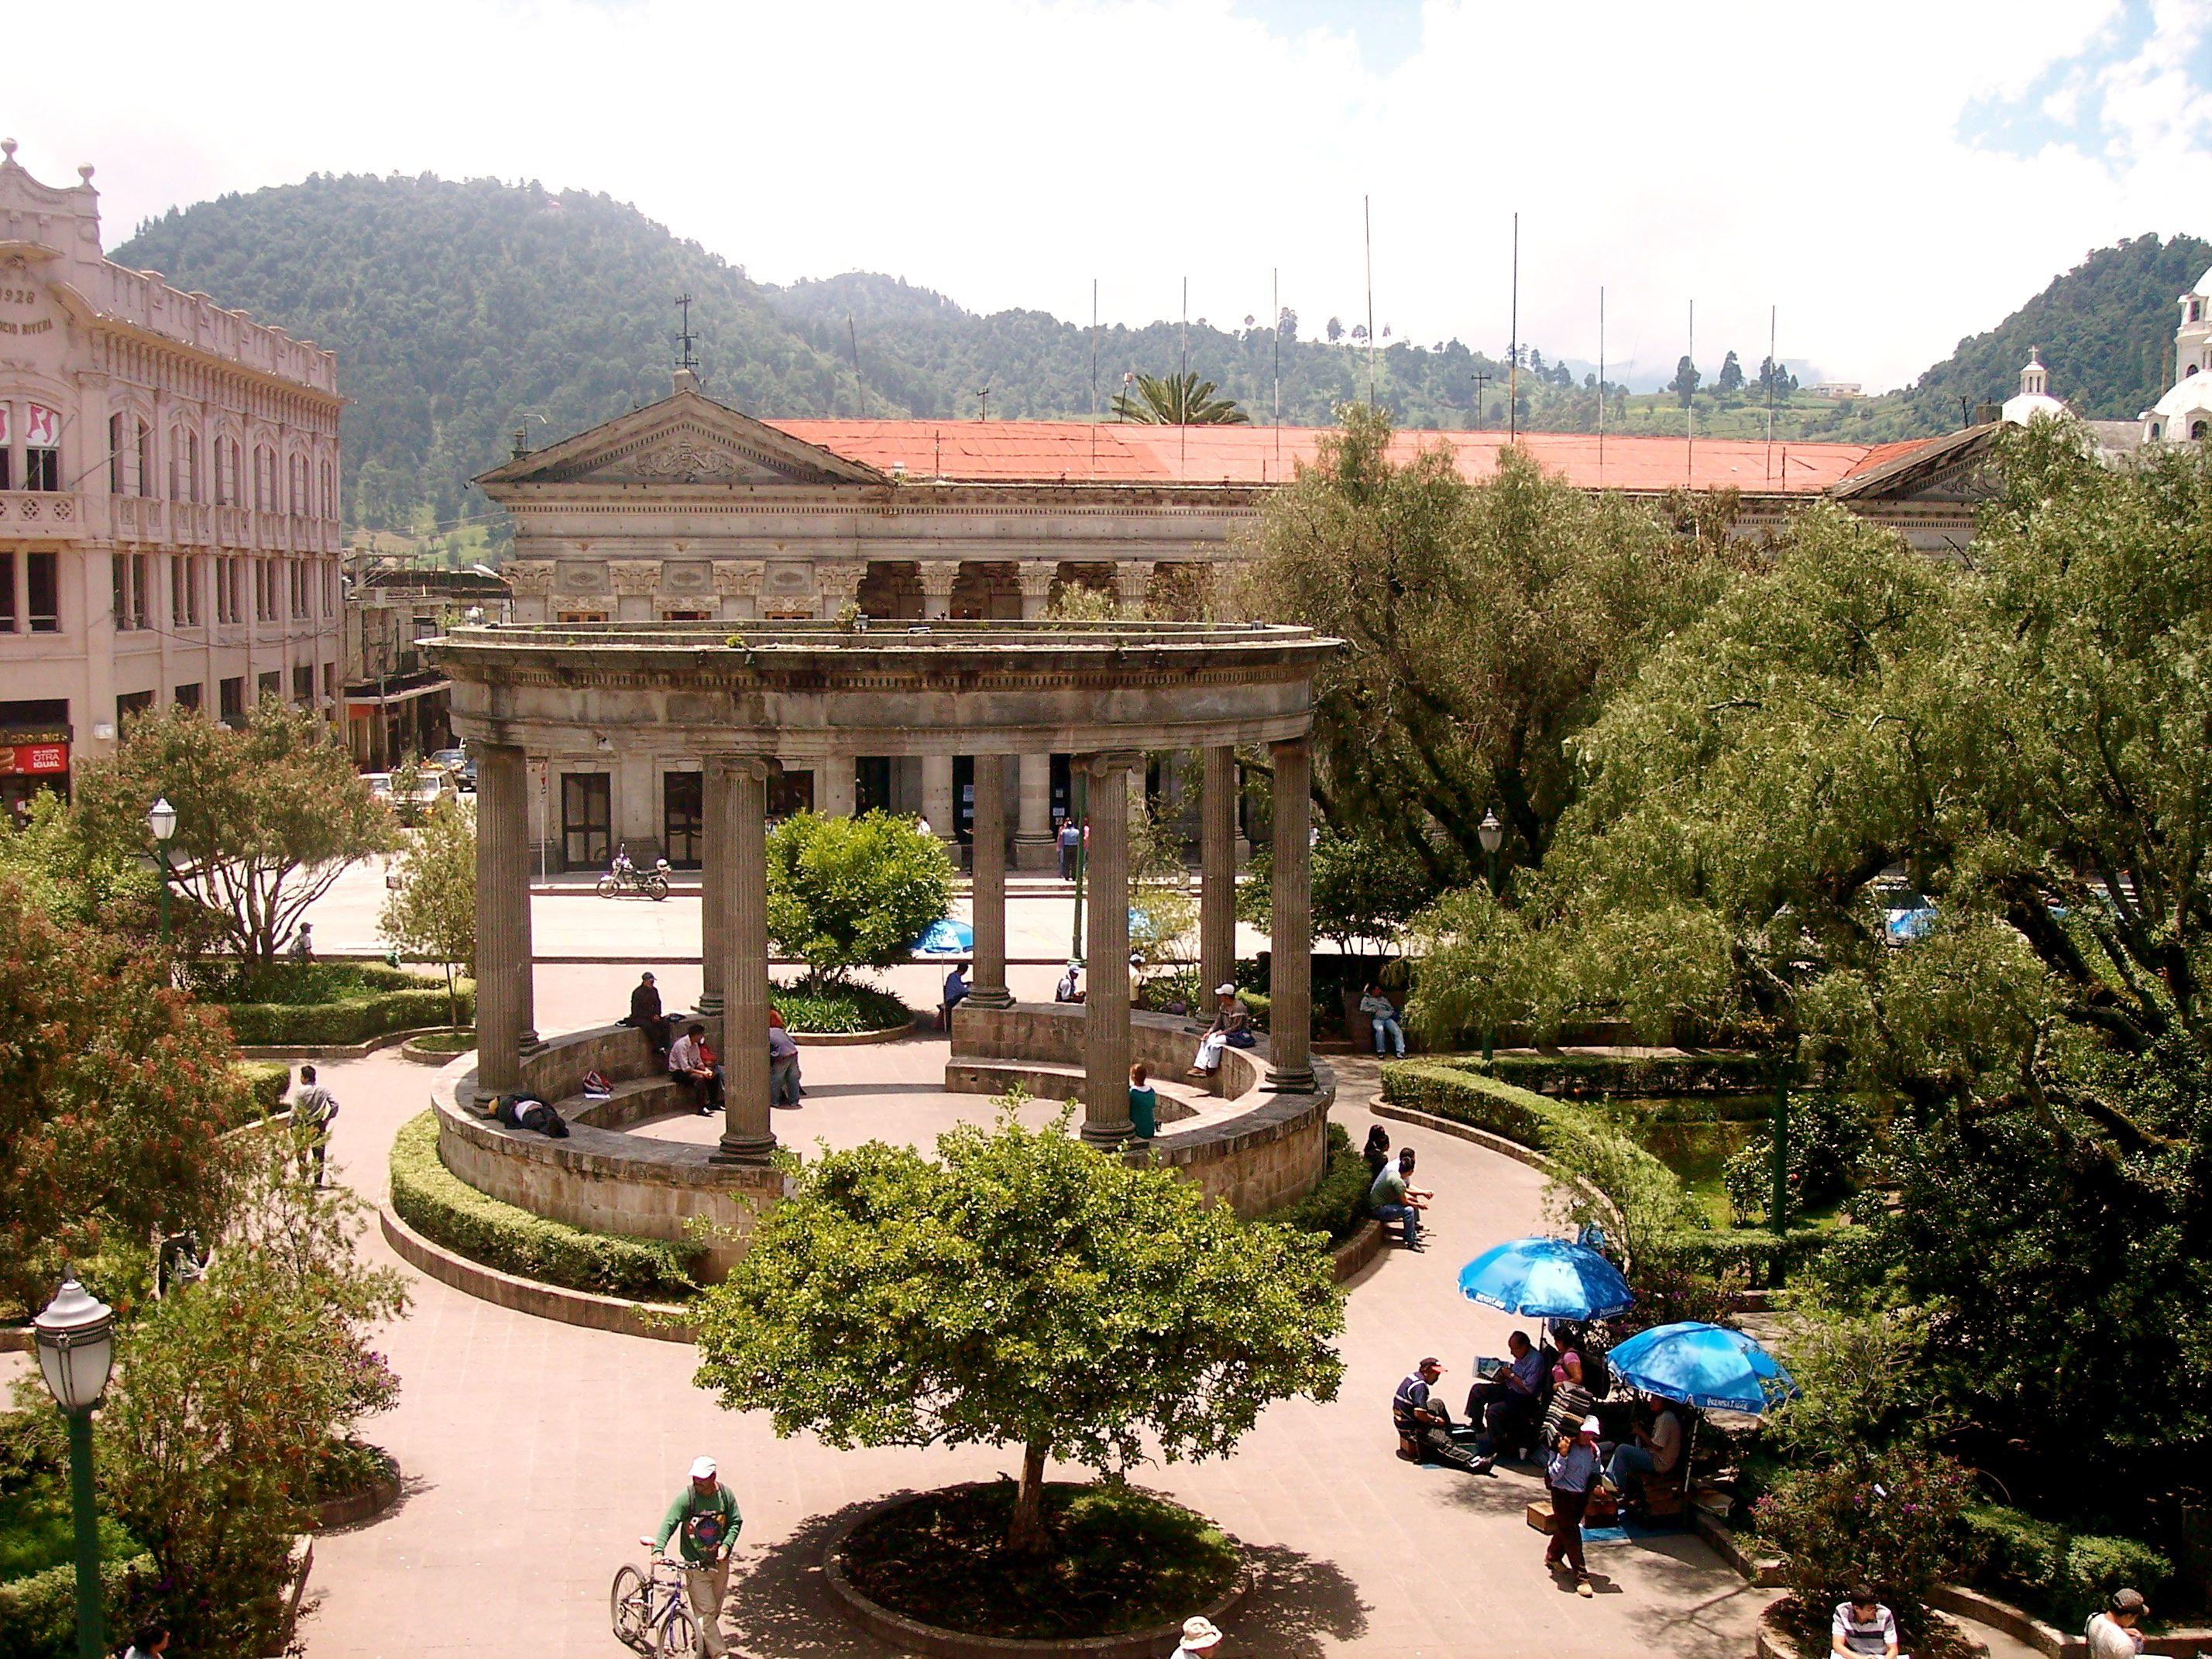 Parque Central; Quetzaltenango, Guatemala   Guatemala city, Guatemala, Global travel